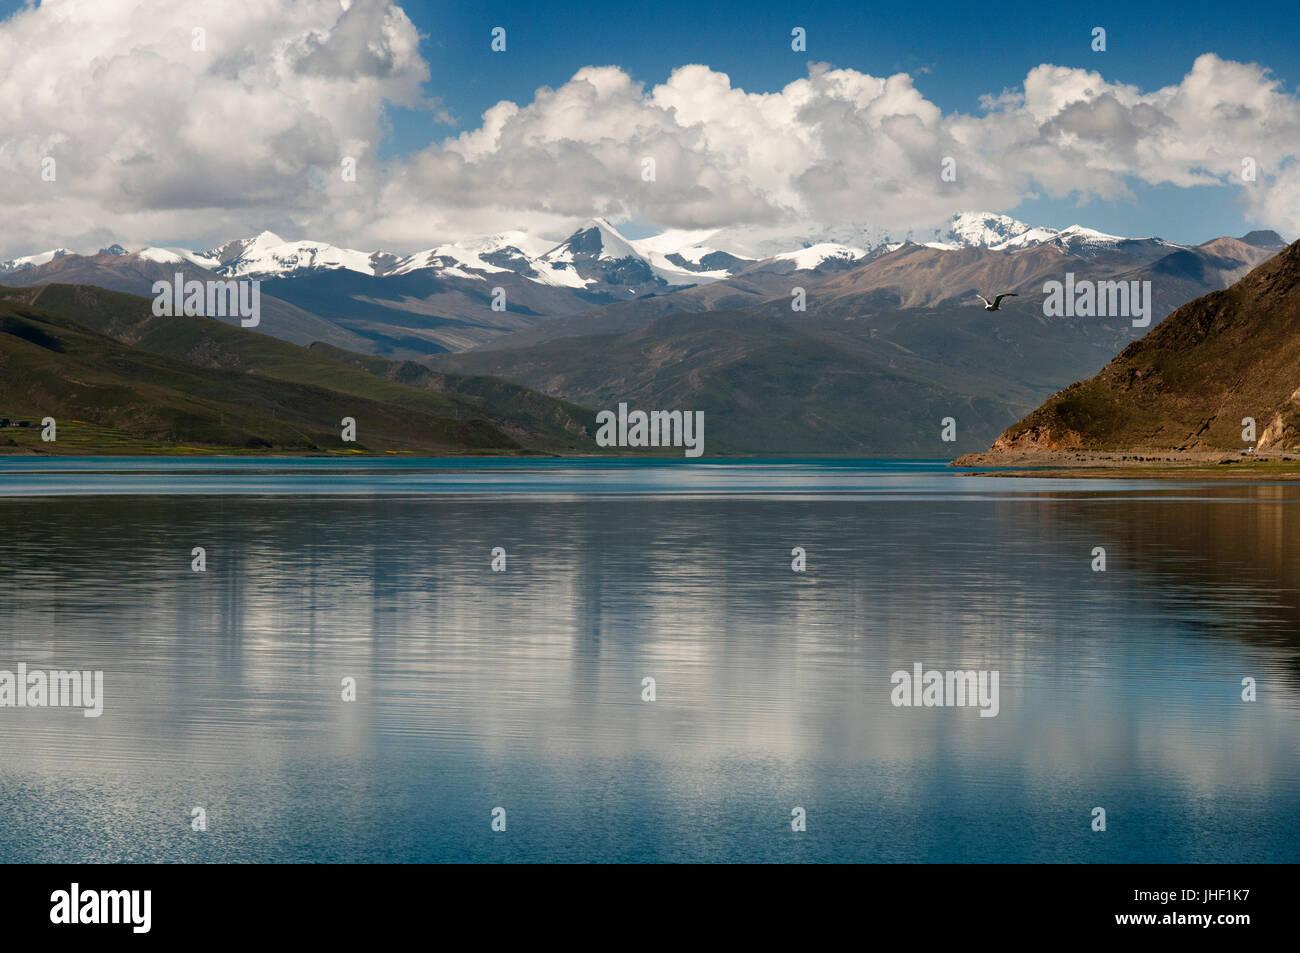 Tibet's Sacred Yamdrok Tso Lake (Yamzho Yumco in Tibetan), Shannan Prefecture, Tibet, China. Stock Photo